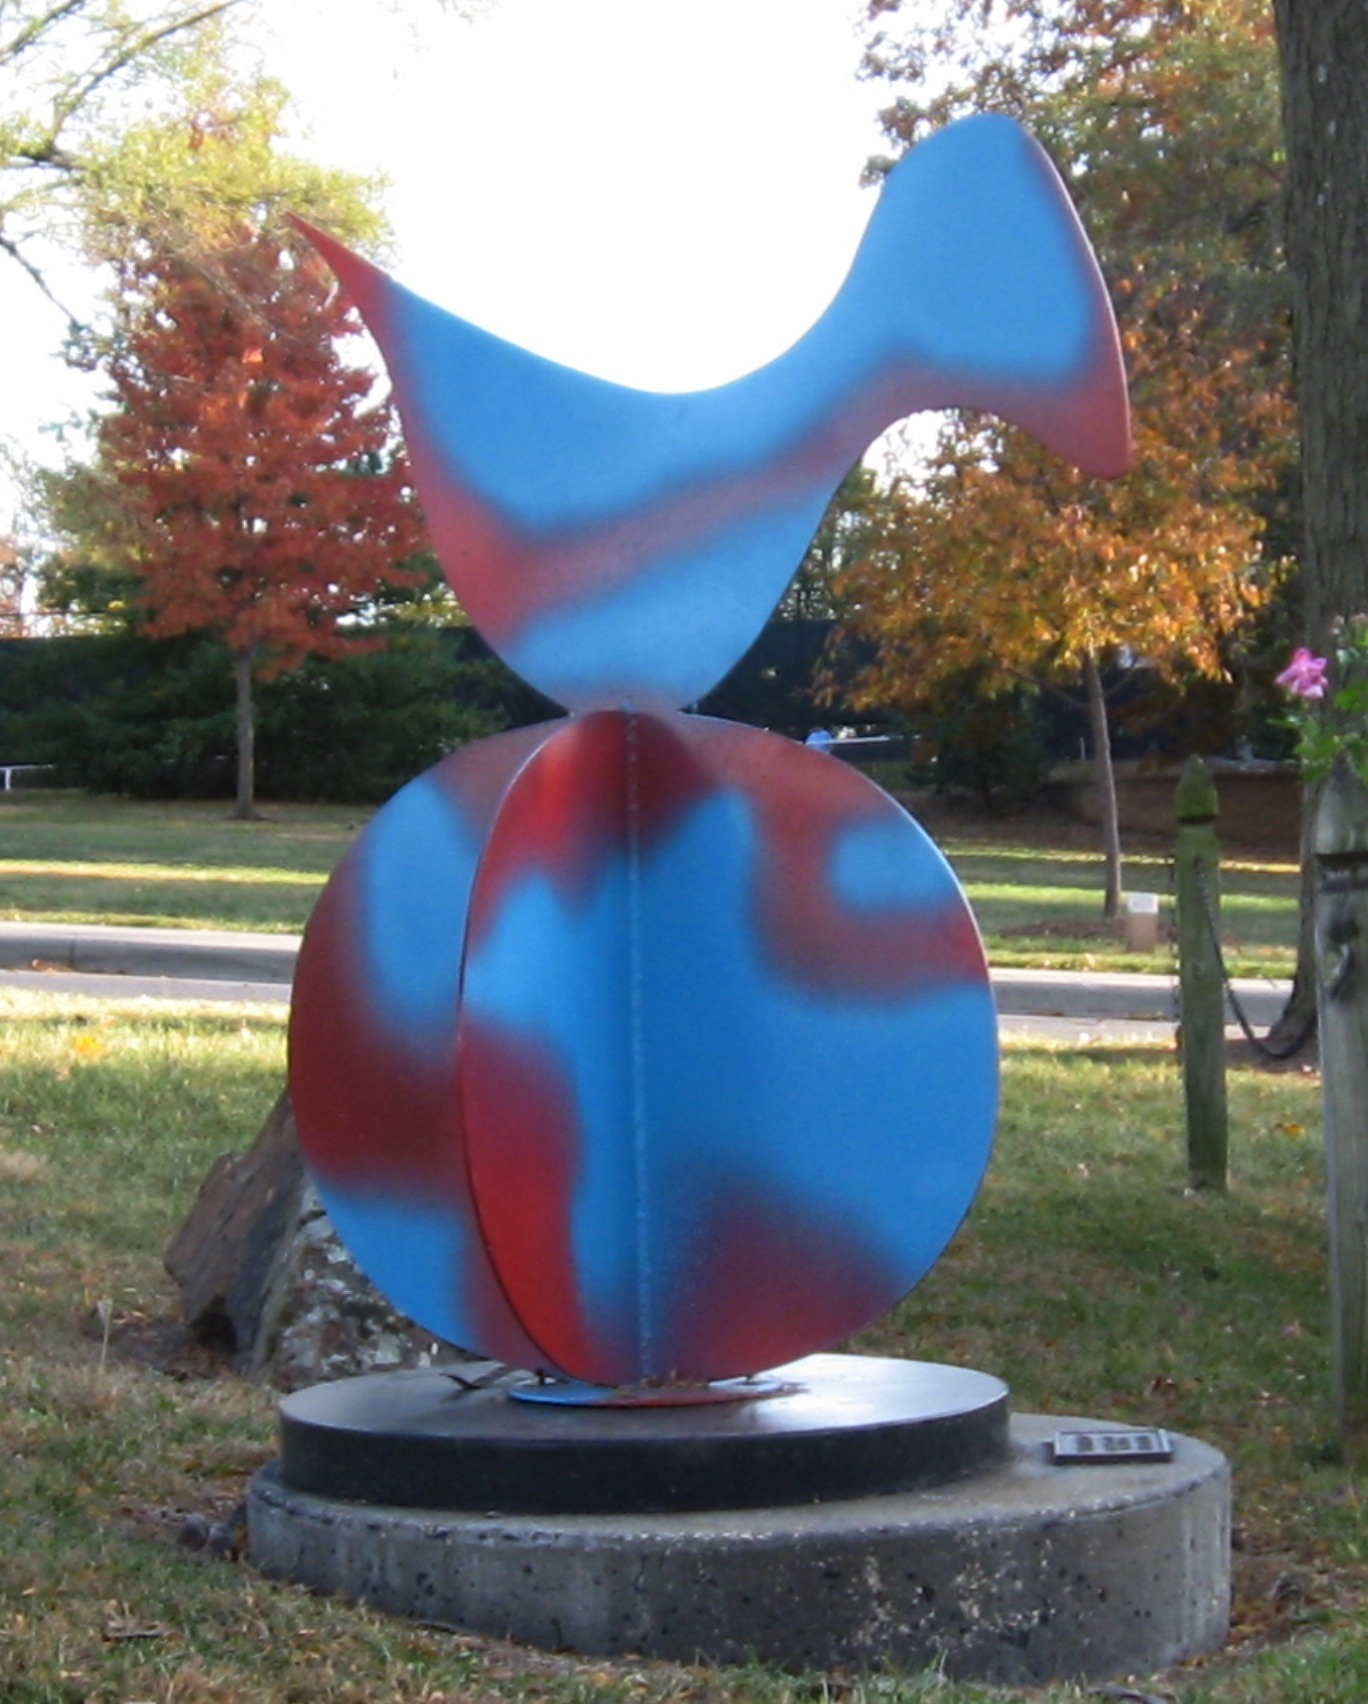 Sky Bird  1996, painted steel, 3x3x3 ft  Taliaferro Sculpture Garden Prairie Village, KS